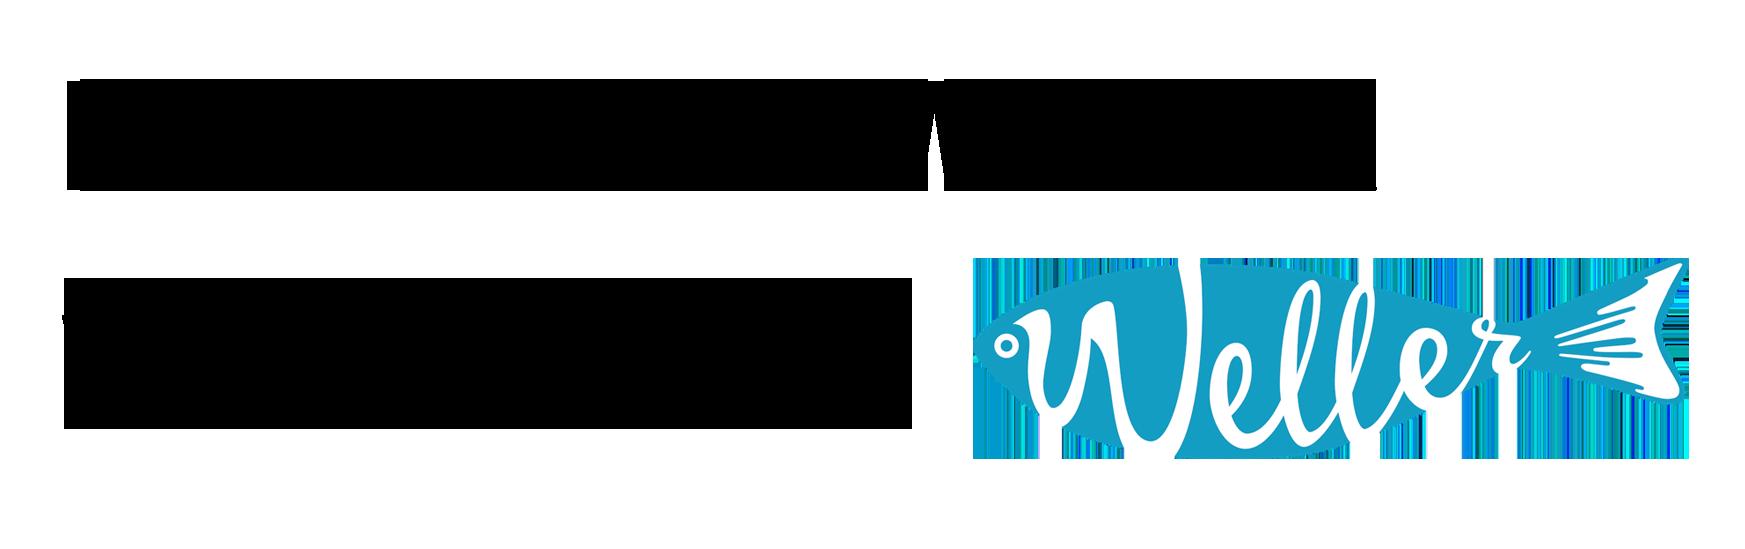 Fischzucht Weller